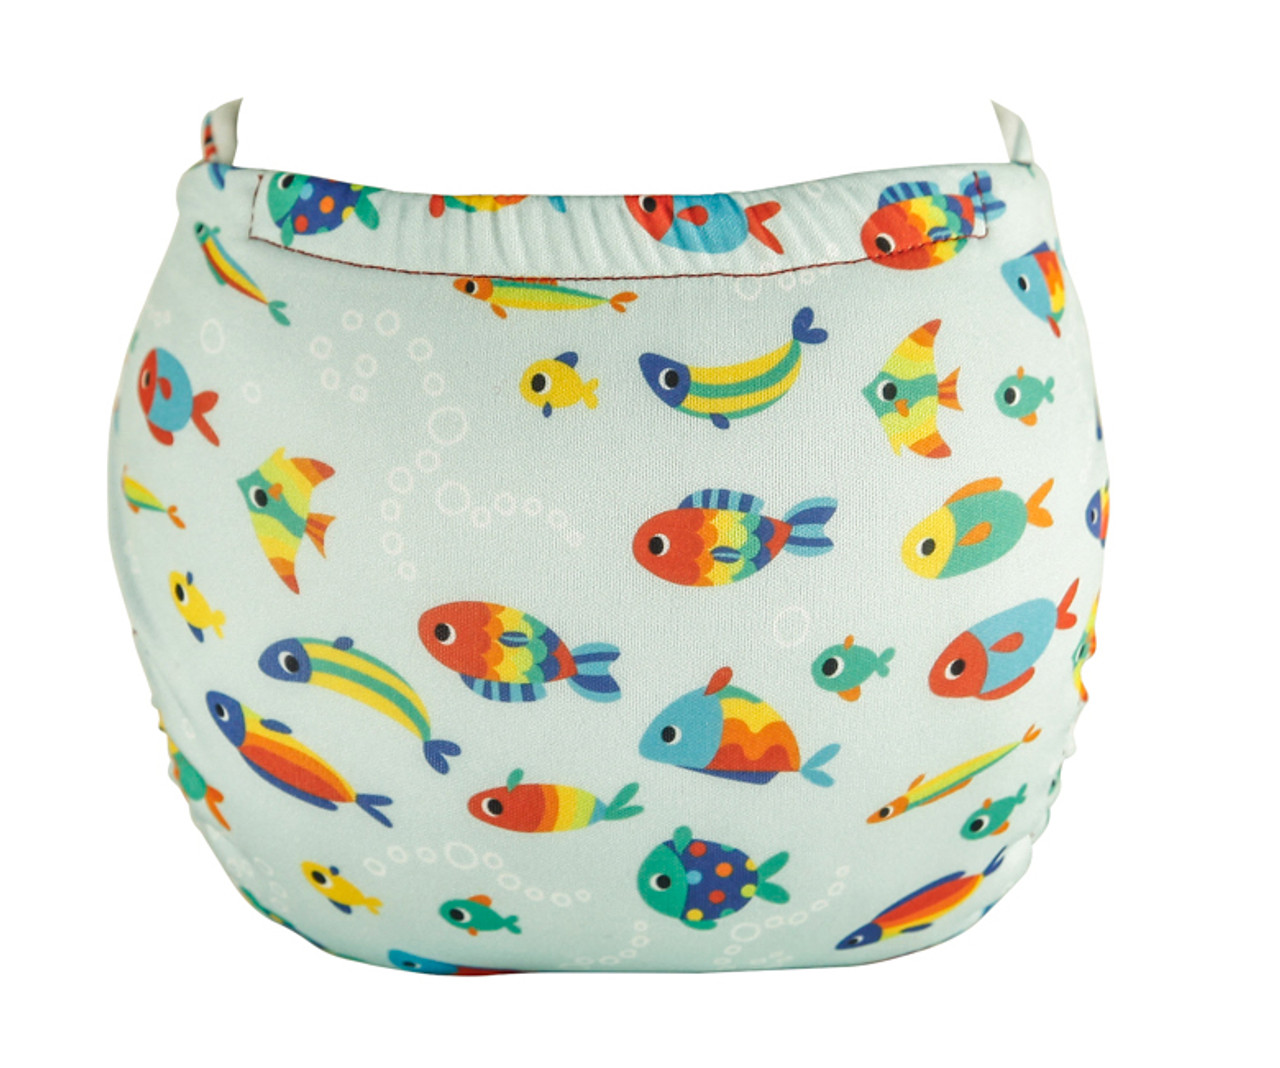 Swim Diaper by Tots Bots